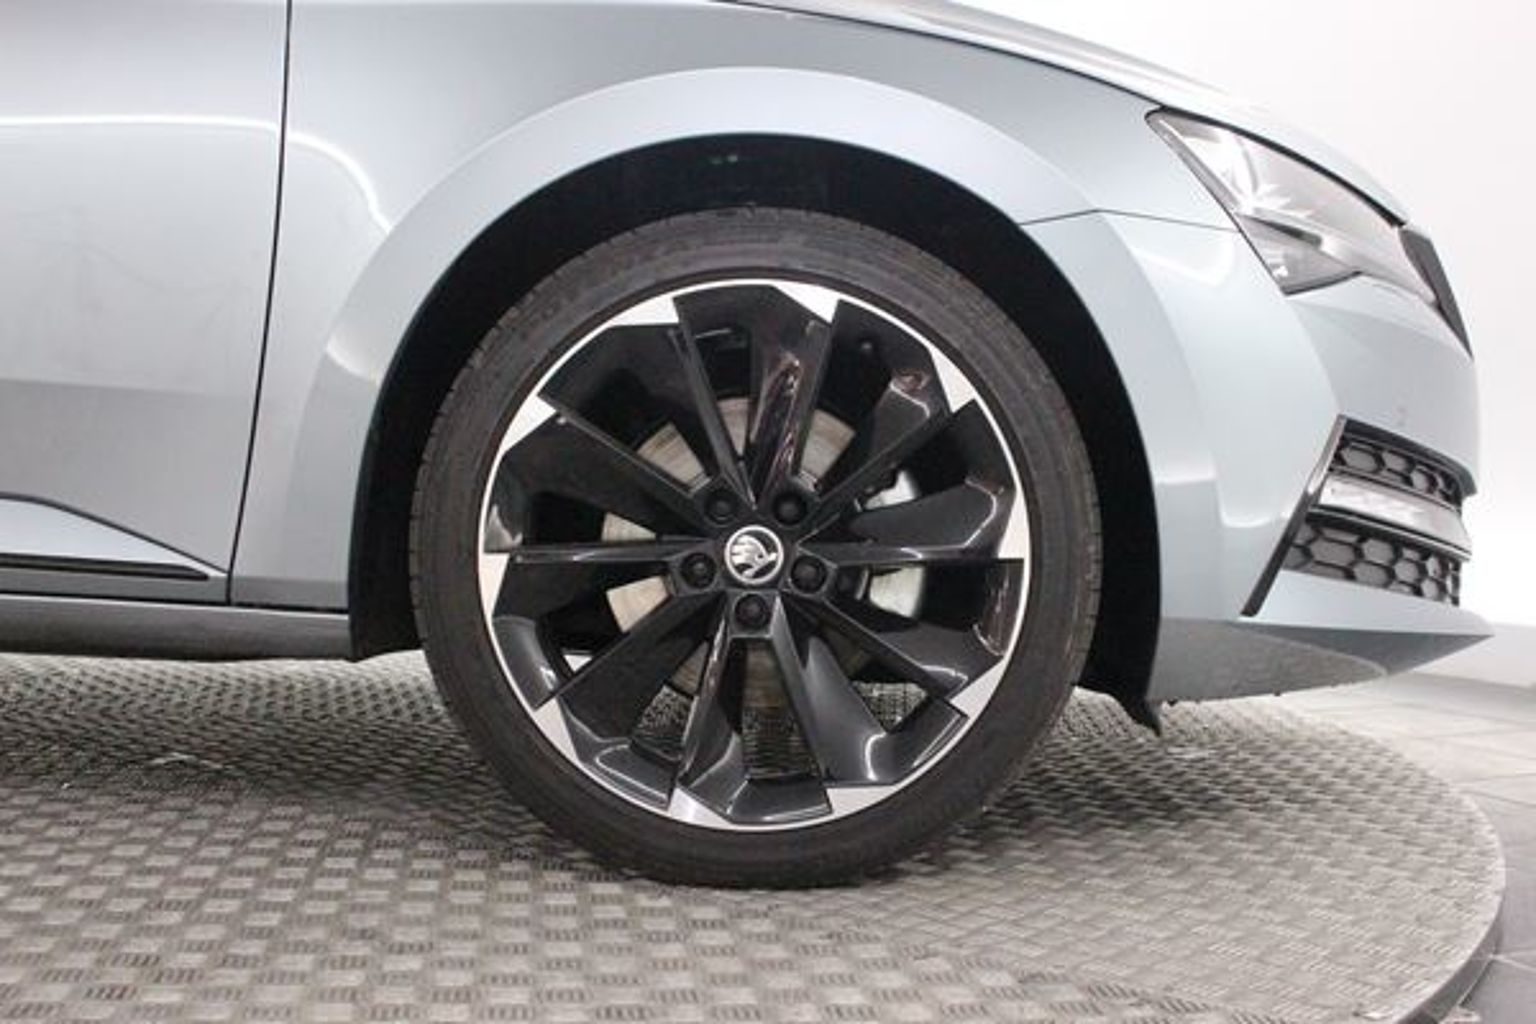 SKODA SUPERB 1.4 TSi Hybrid Sportline Plus DSG